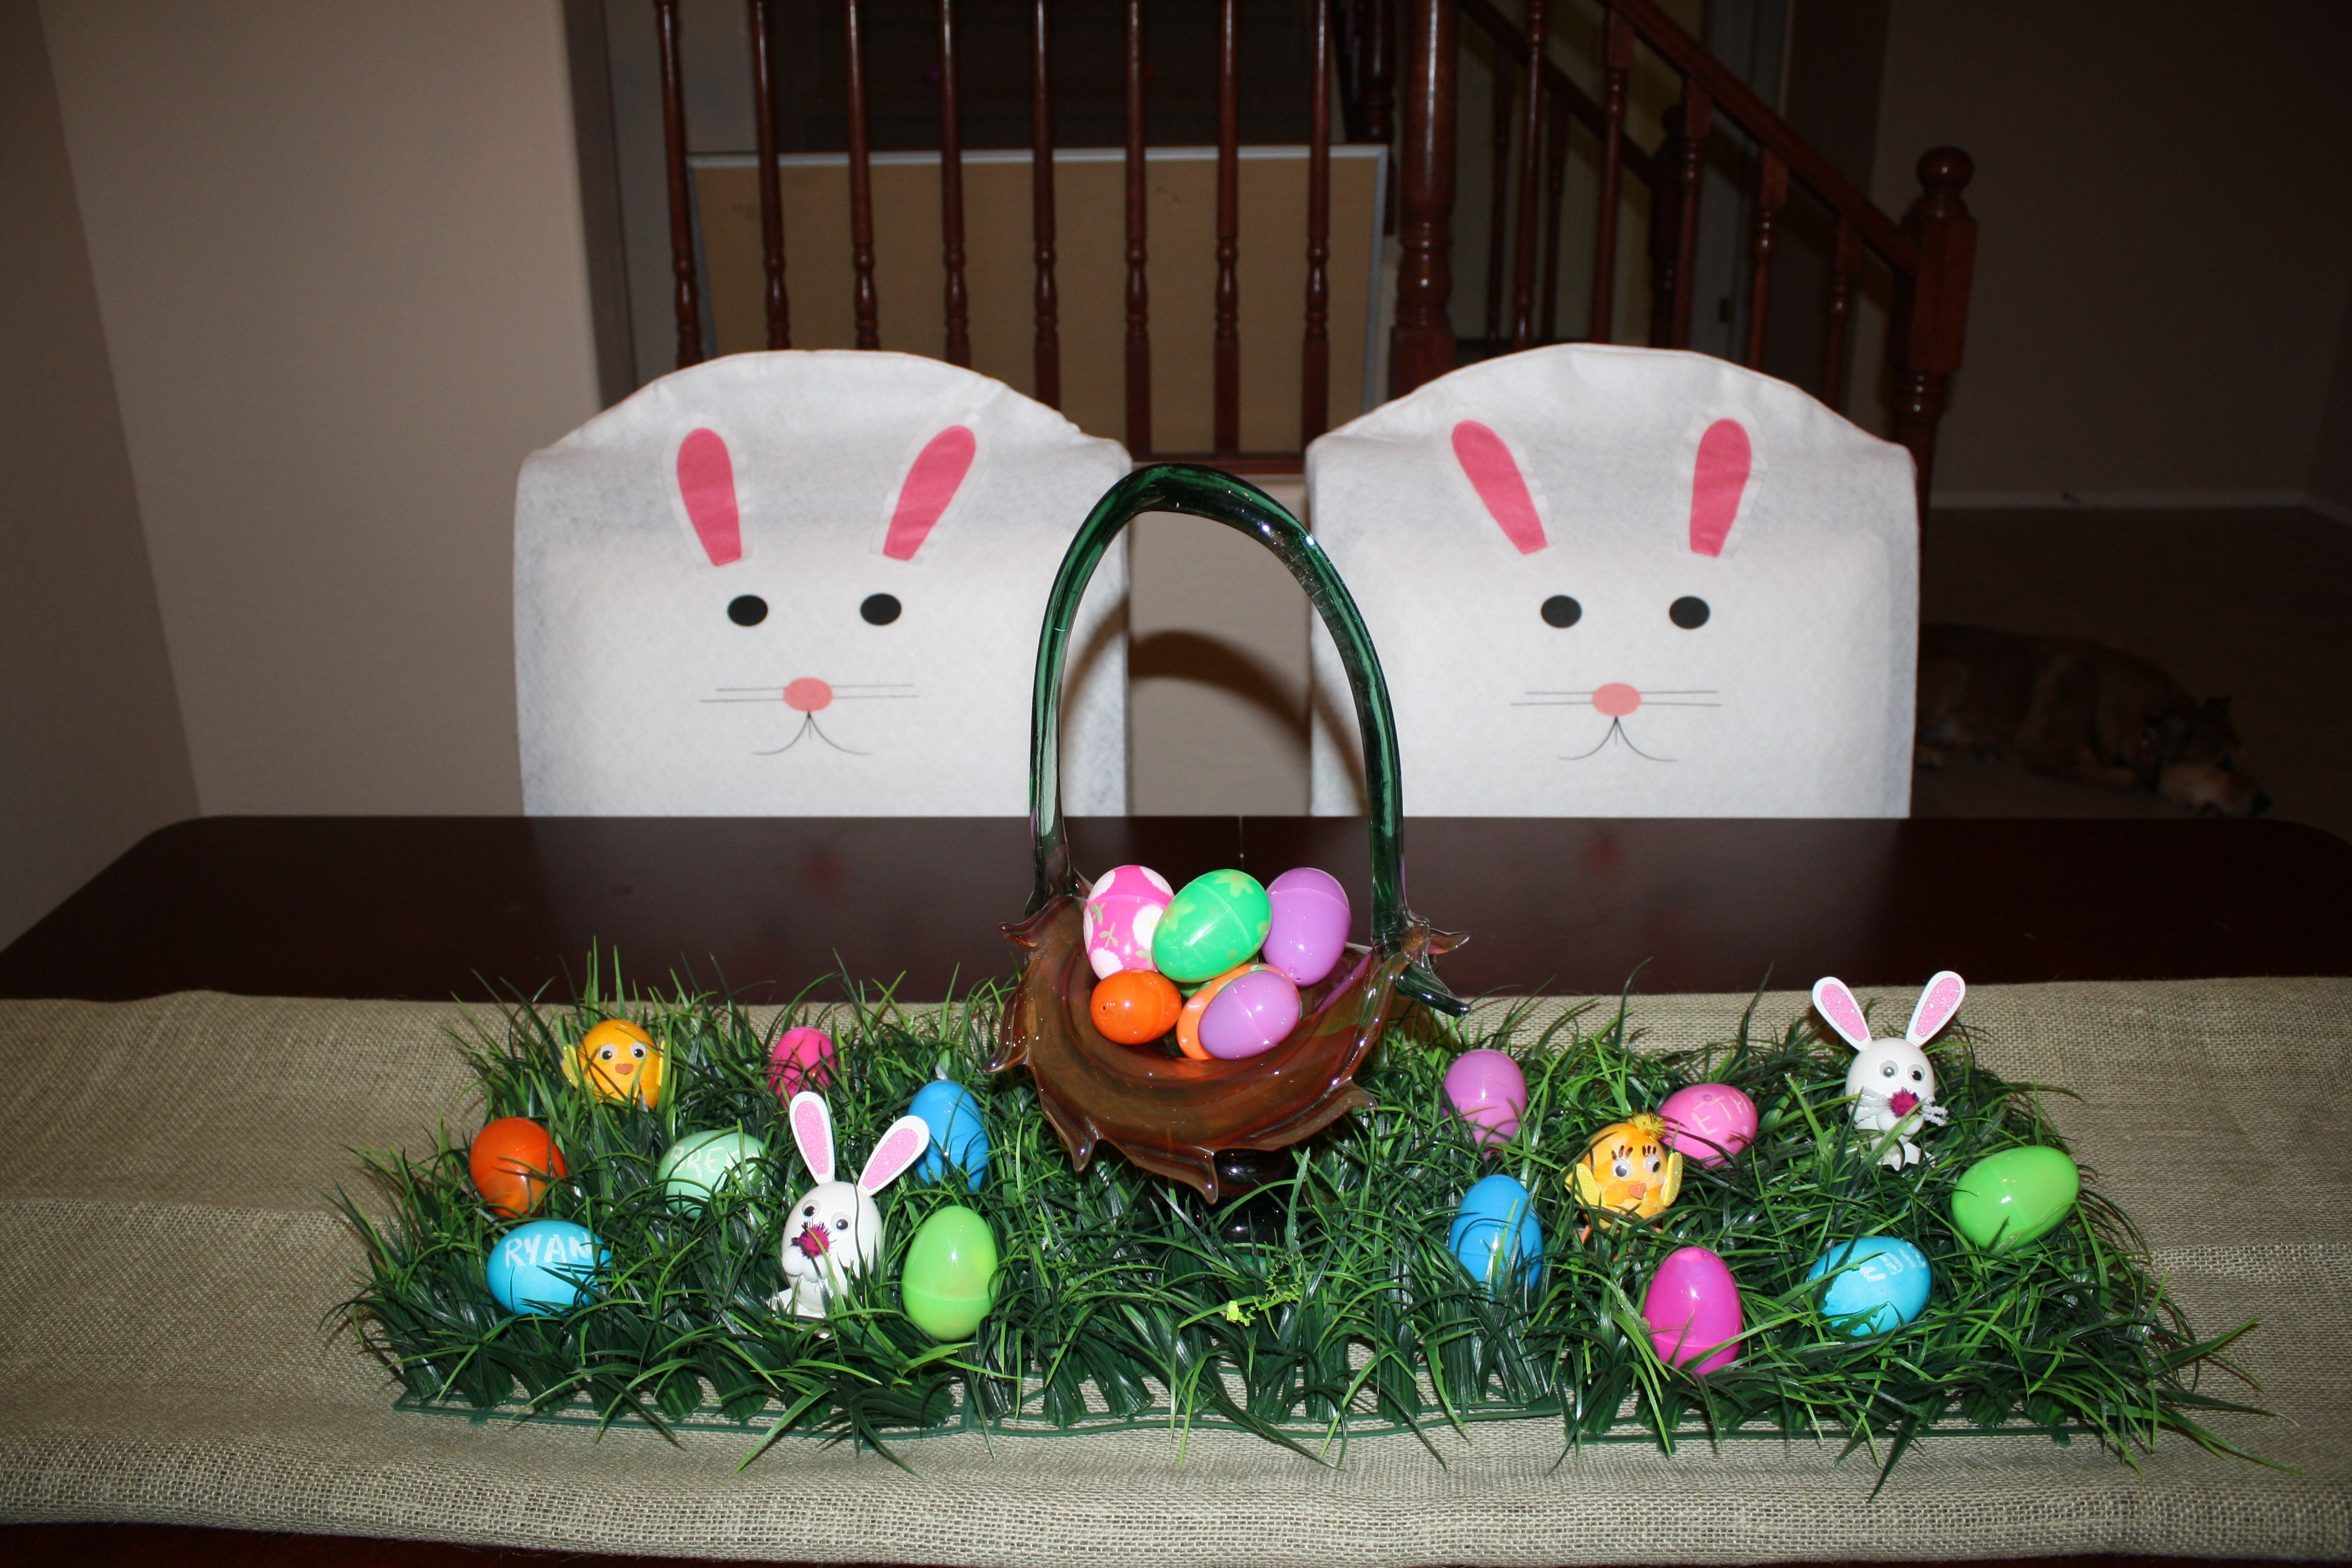 dollar tree bunny chair covers upholstered living room fake easter grass from hobby lobby burlap table runner